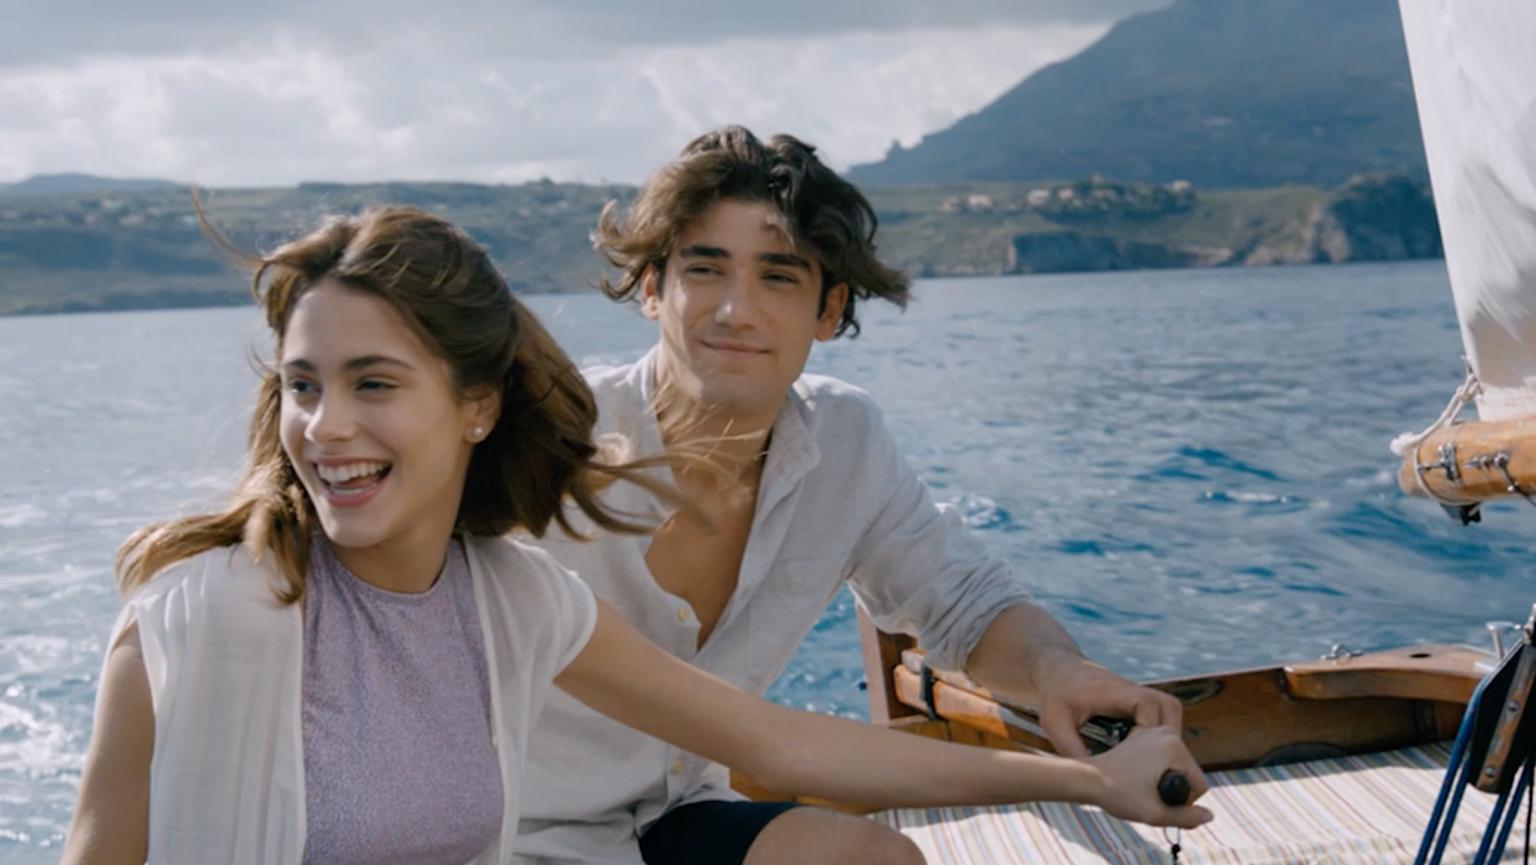 Tini - El Gran Cambio de Violetta - Trailer 2